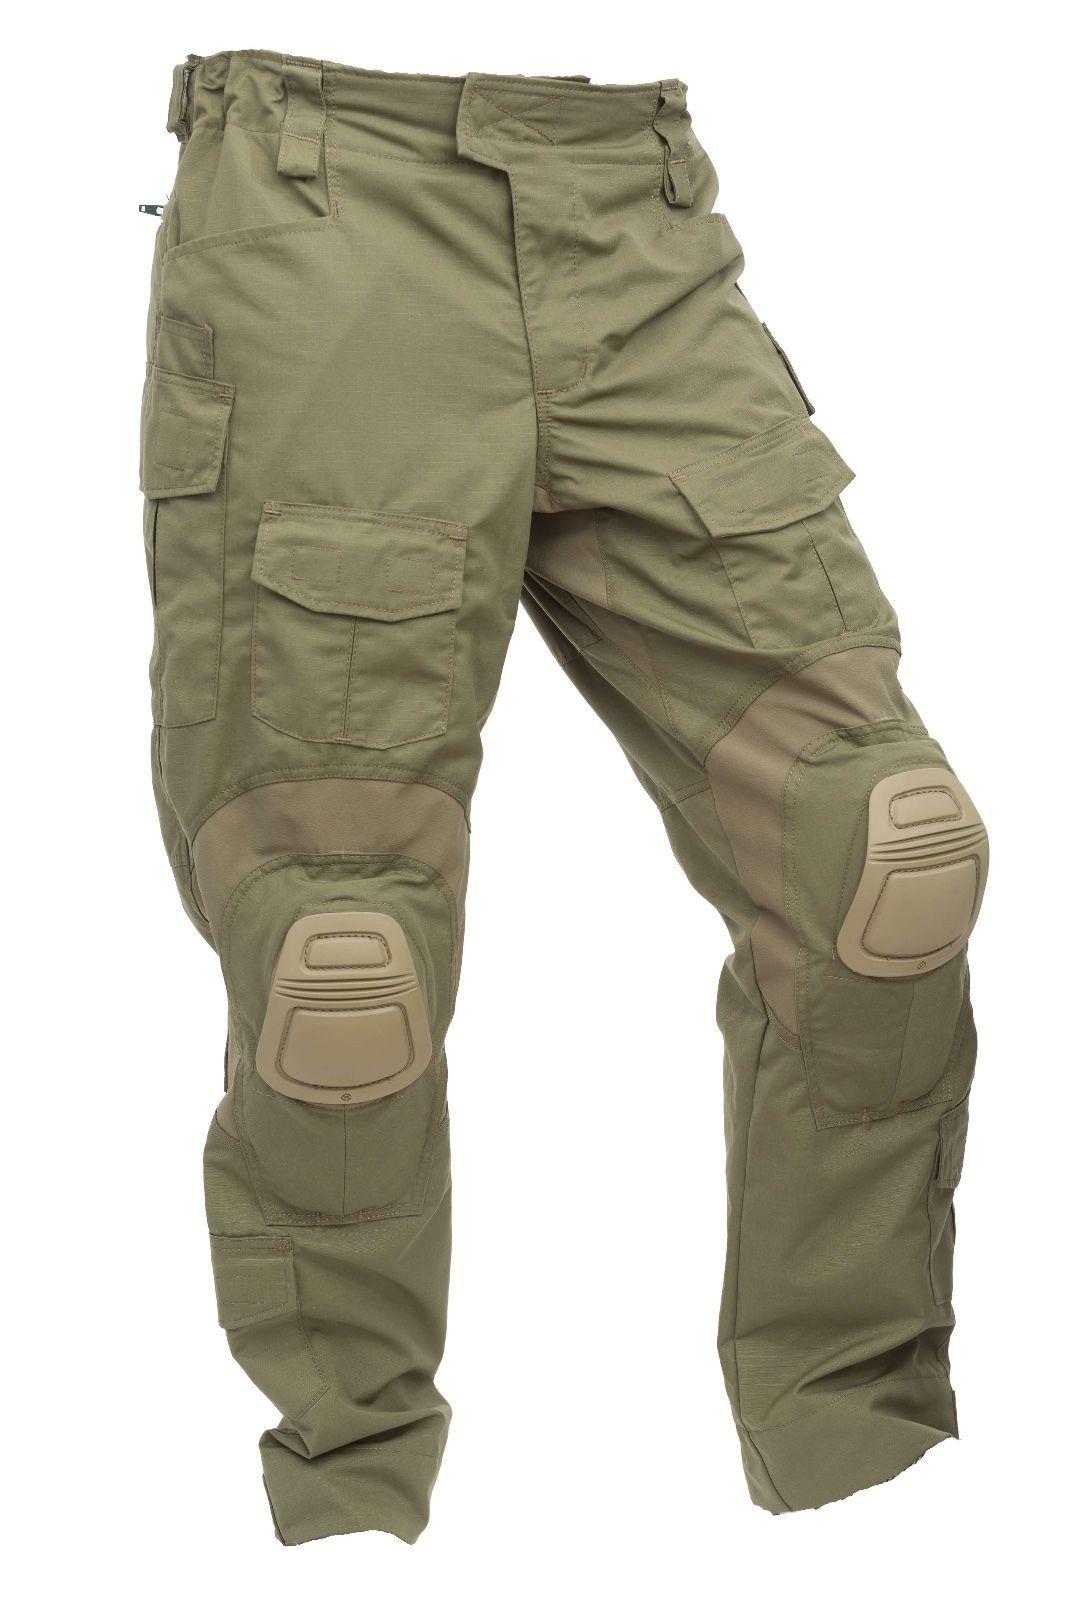 fb685294630a6 Custom Repro Crye Precision Style G3 Combat Pants Ranger Green 38r ...